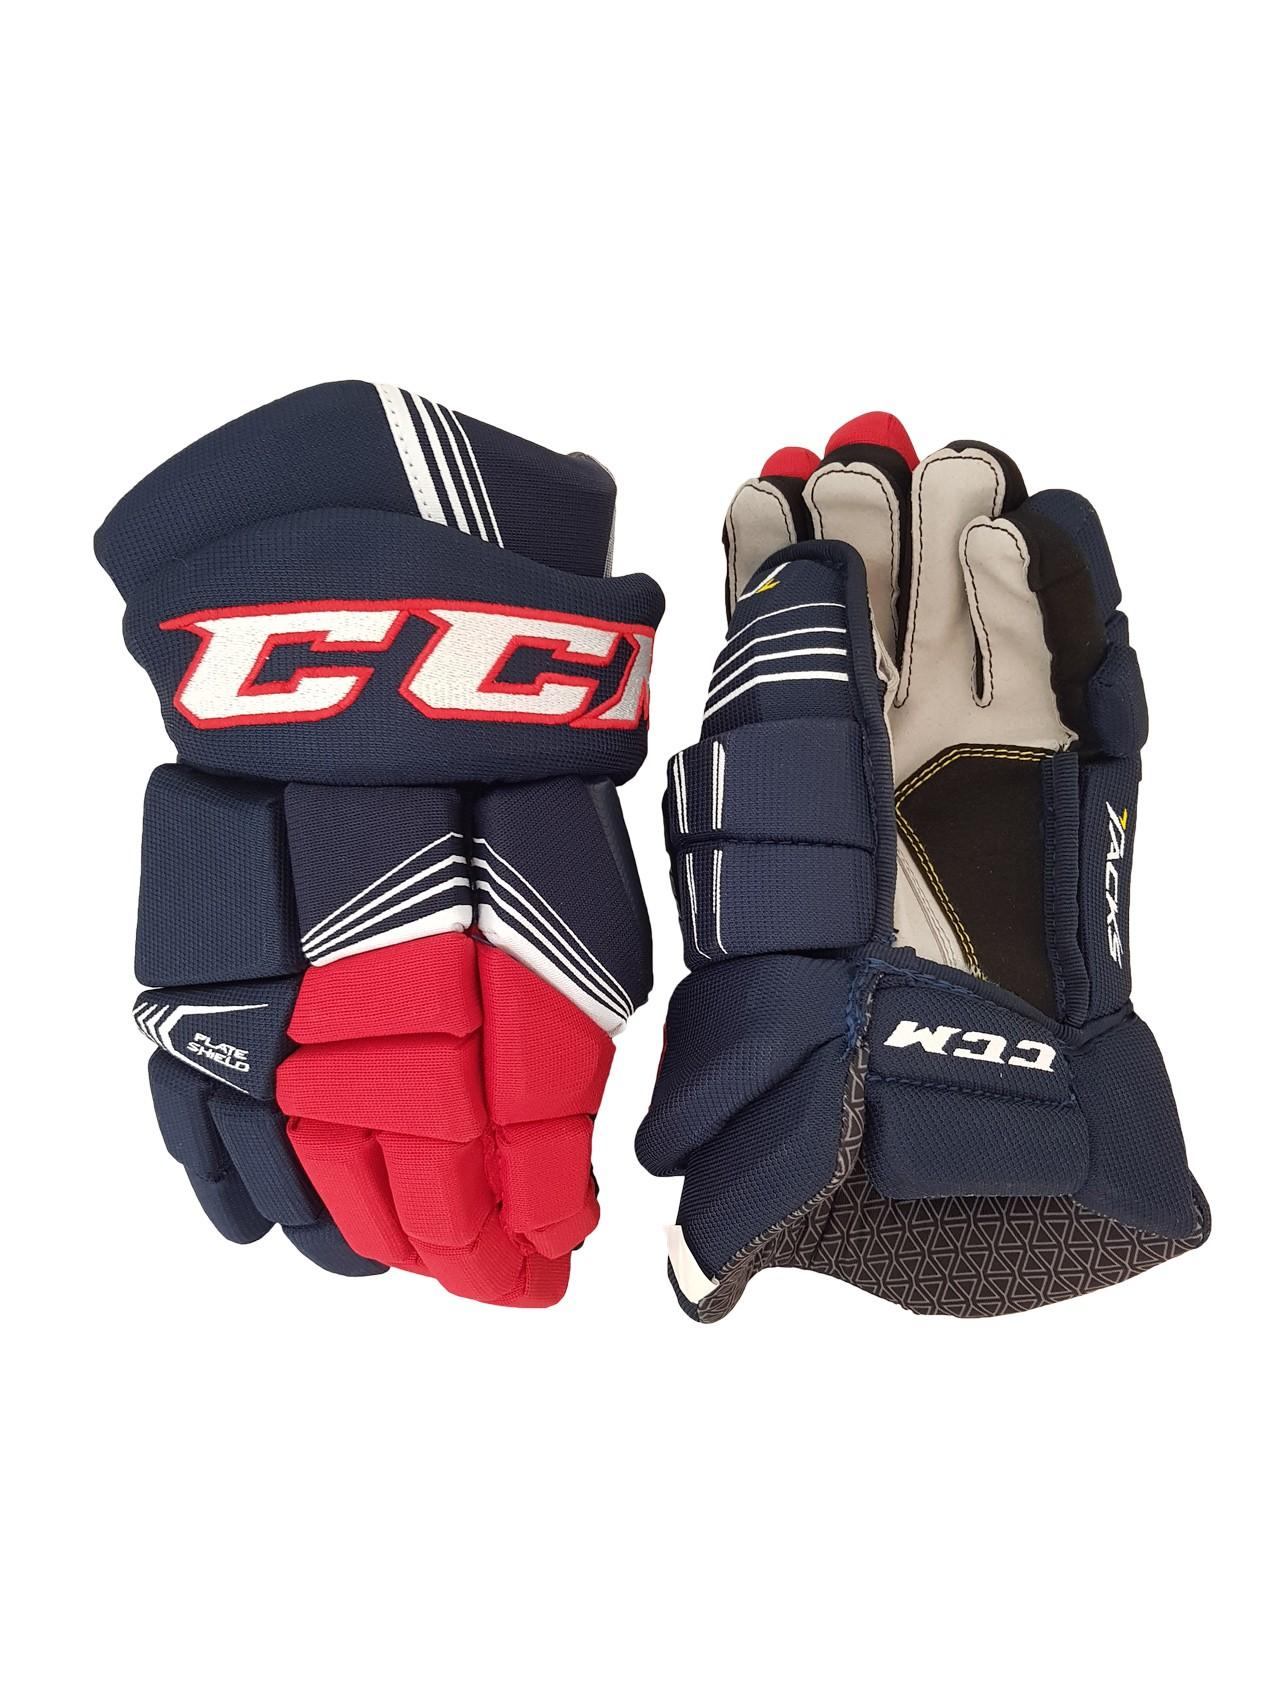 CCM Tacks 5092 Junior Ice Hockey Gloves